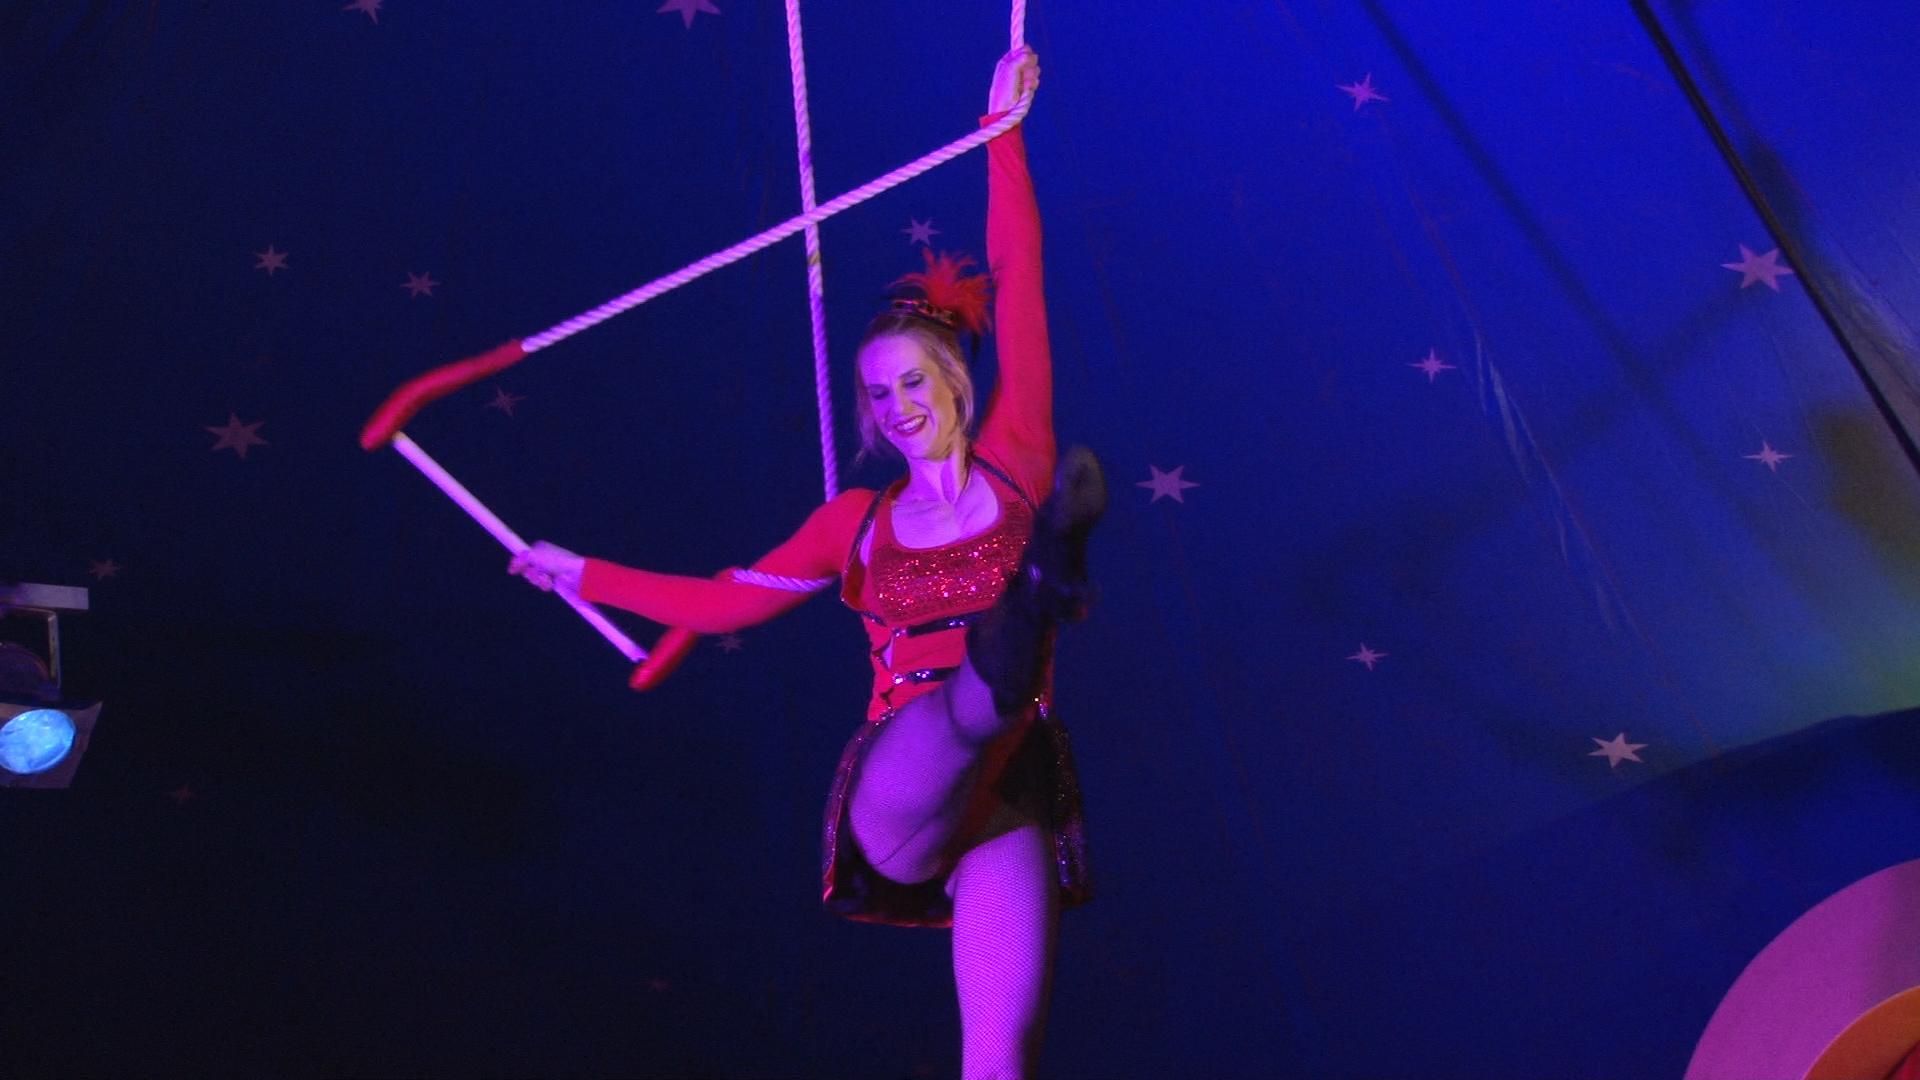 Laura-Cohen-Trapeze-Show-circusevents-koeln-1